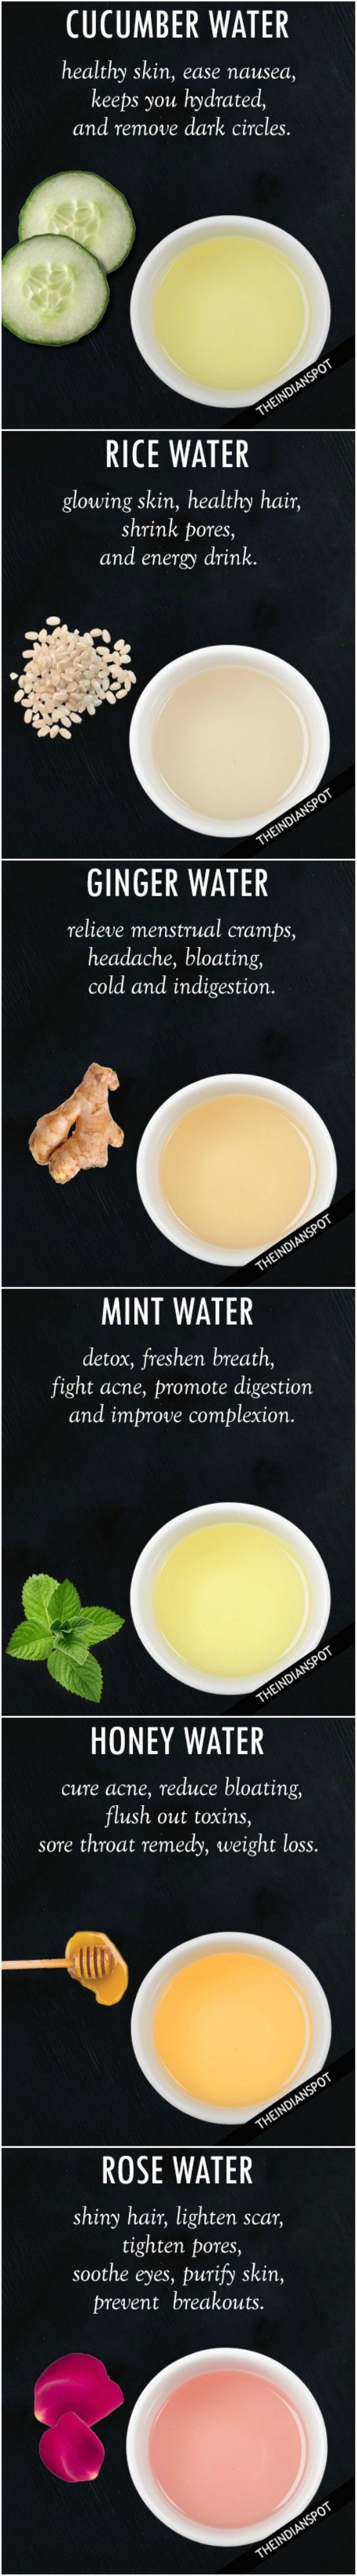 best water remedies